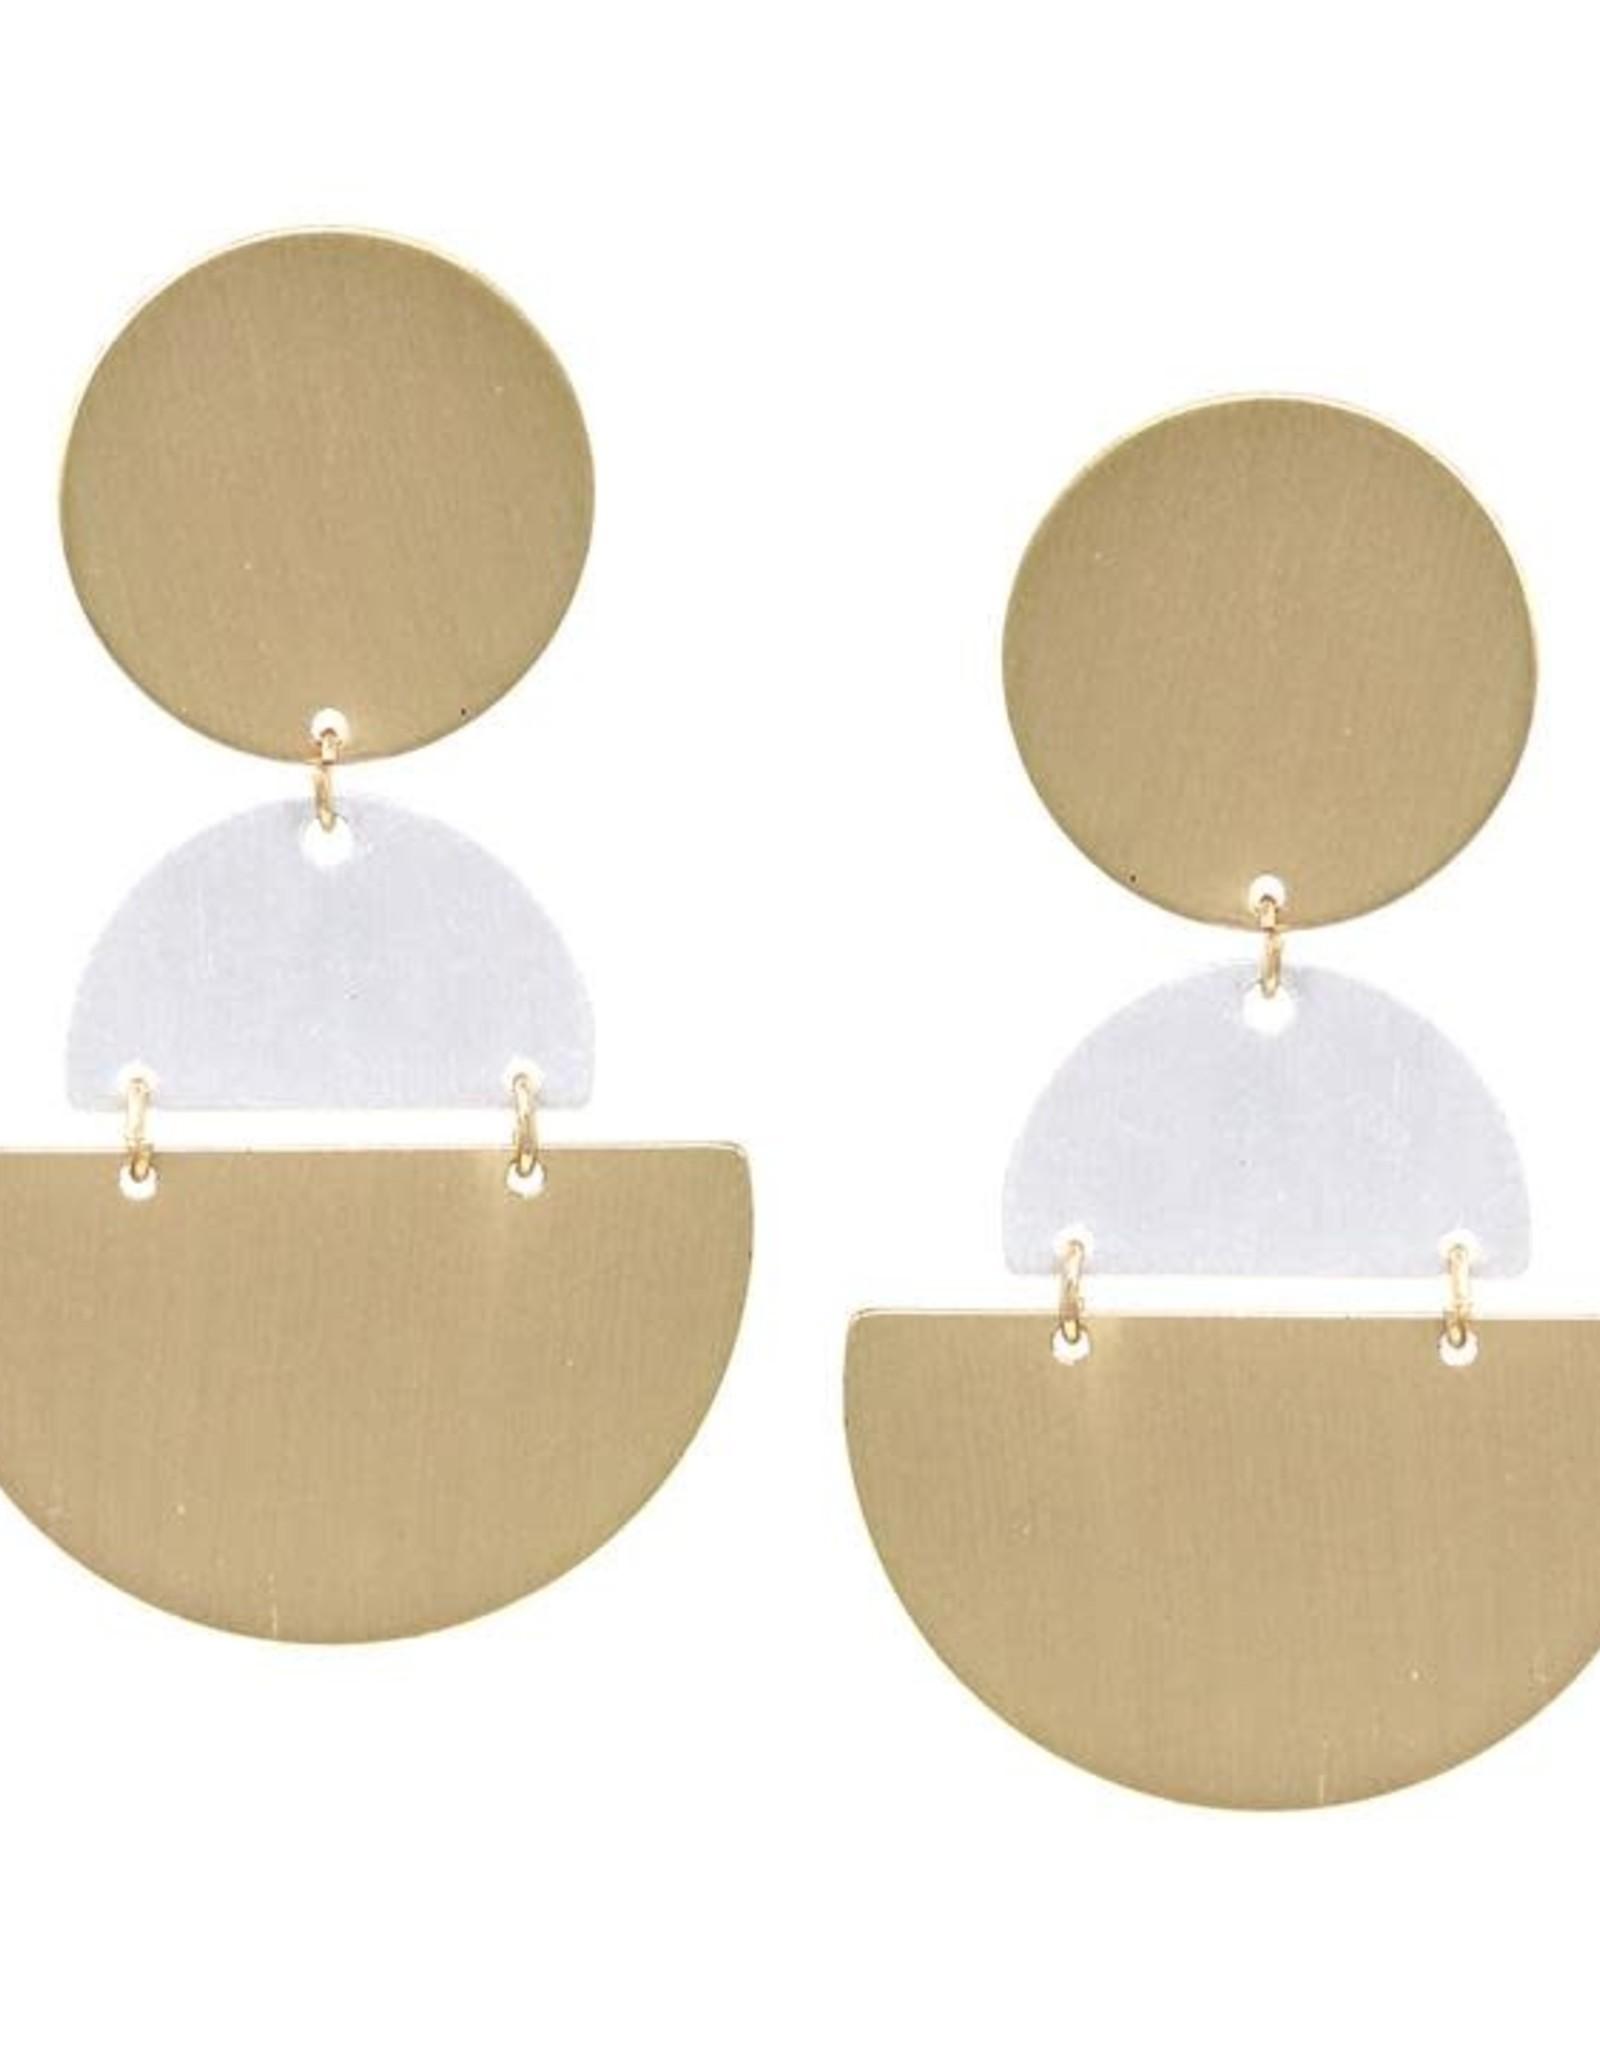 Geometric Shape Satin Finished Metal Drop Earrings